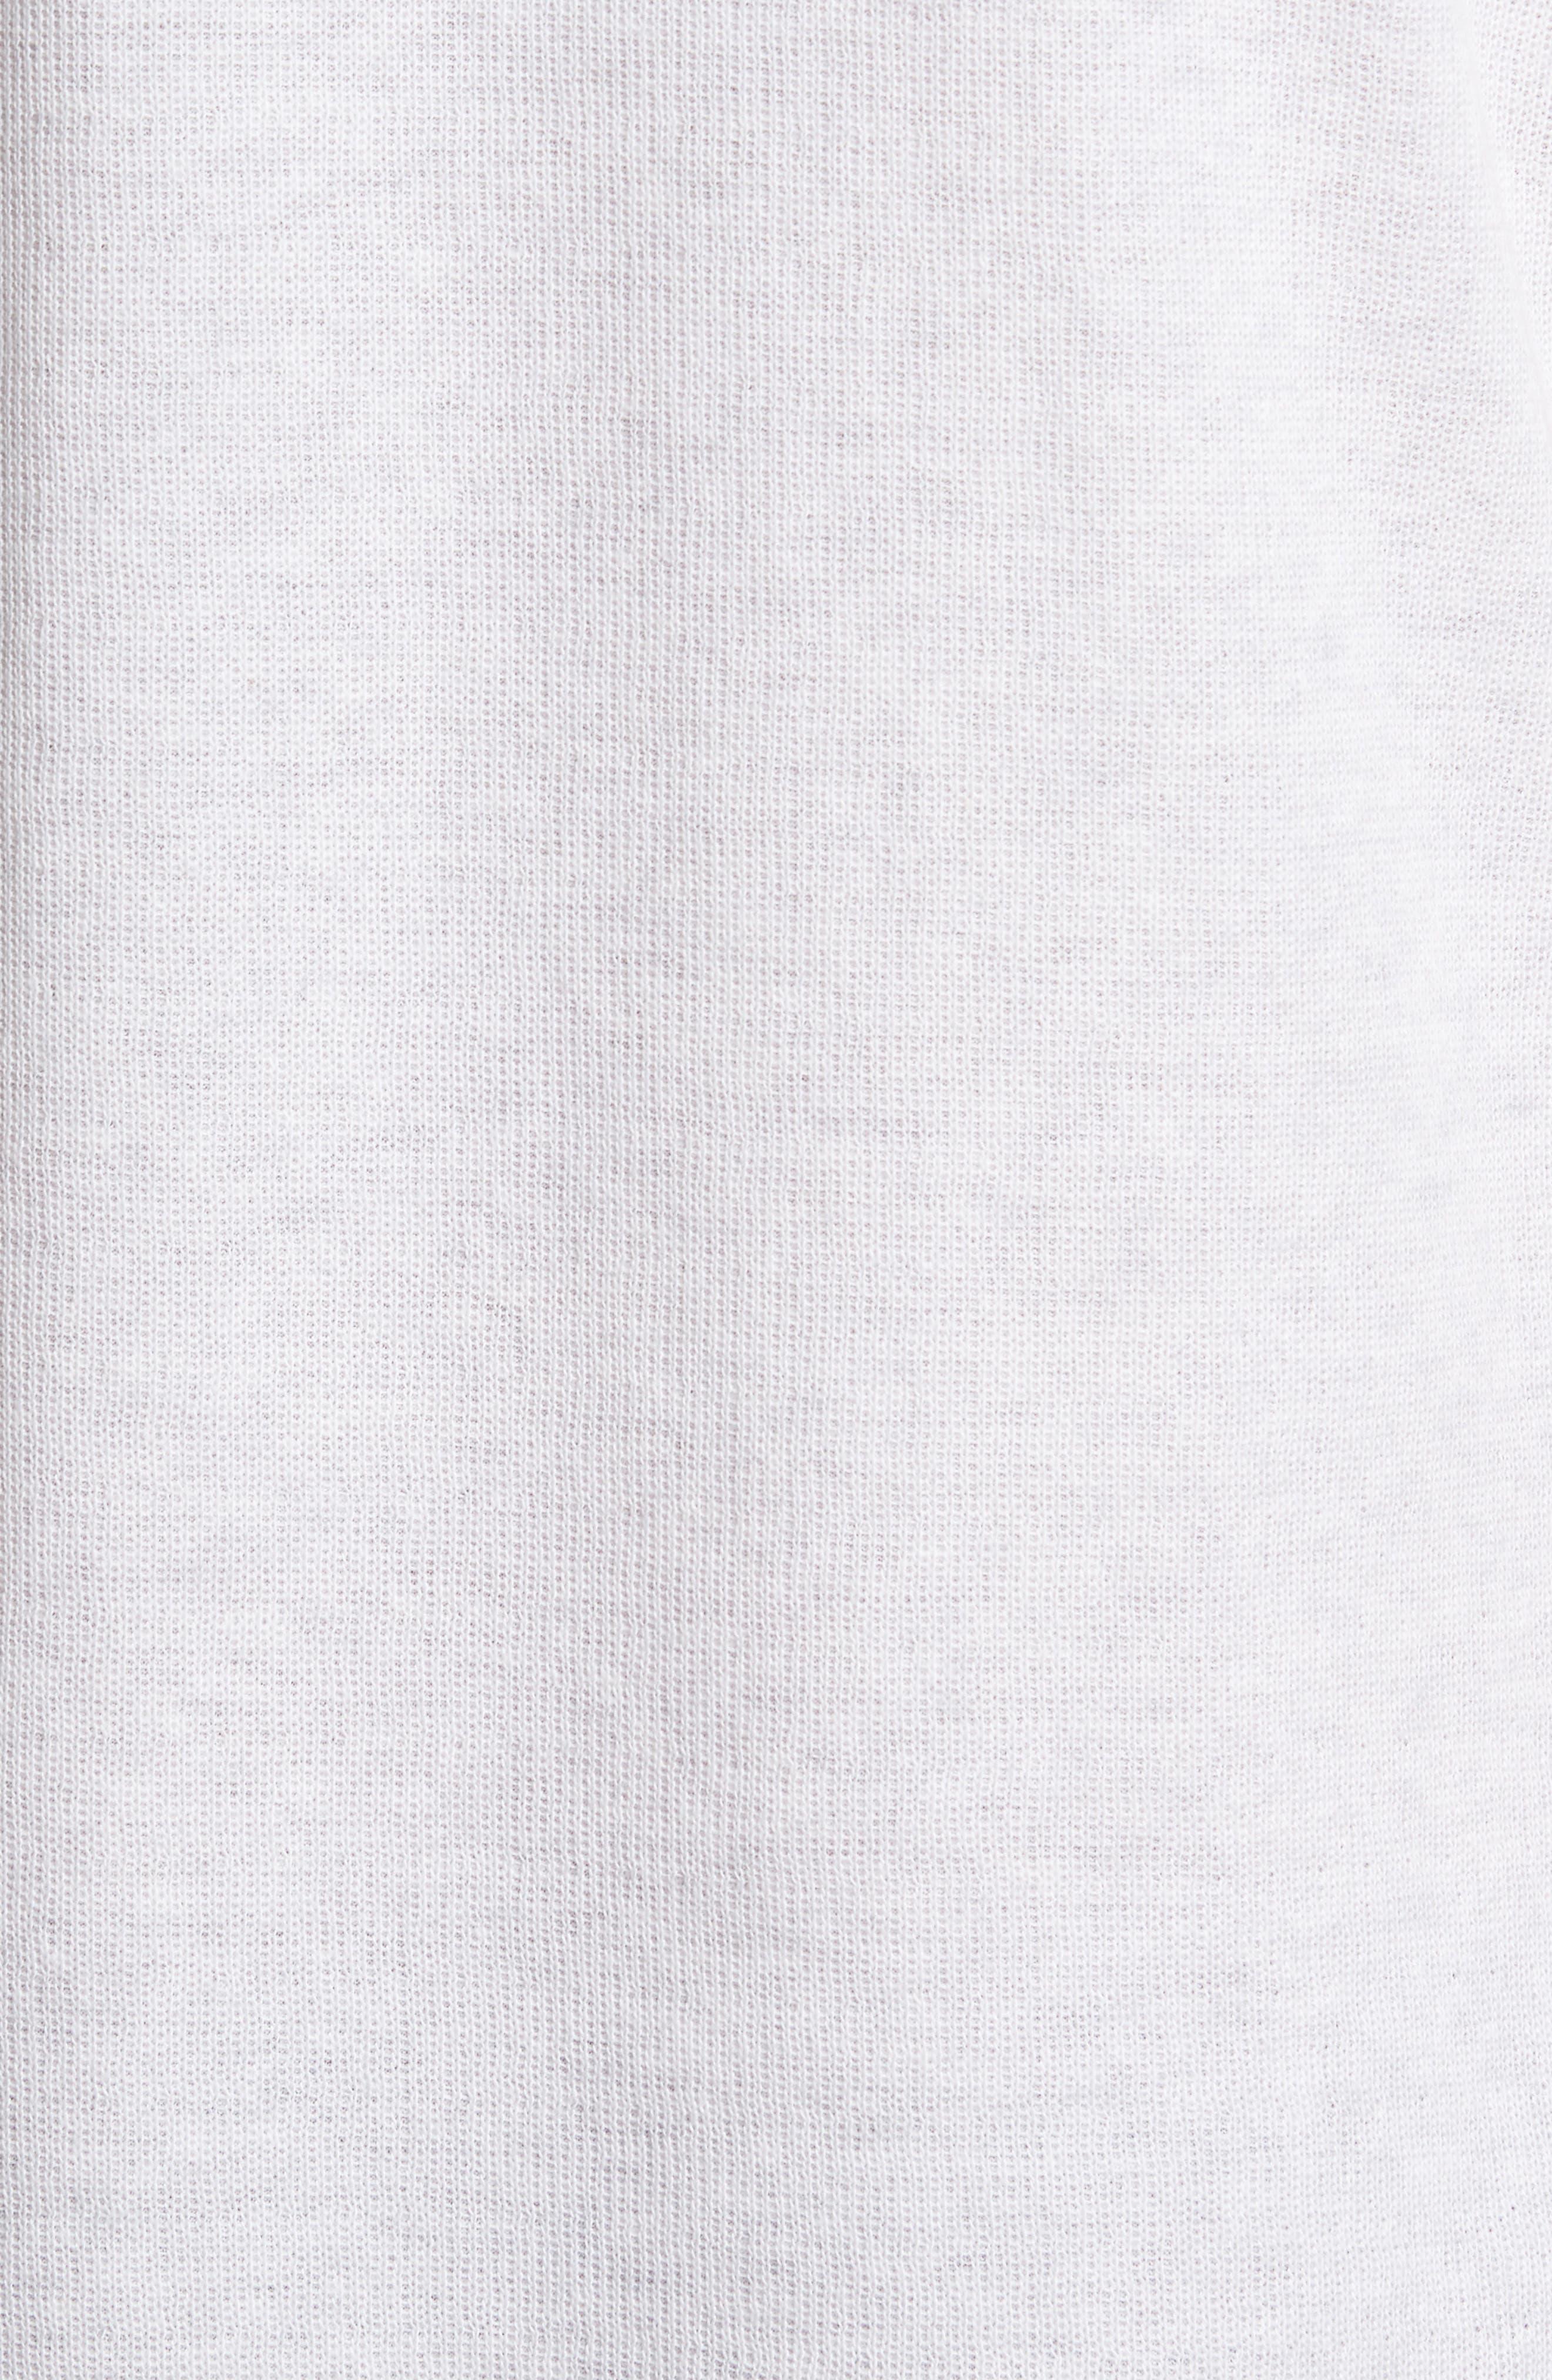 Double Knit Long Sleeve T-Shirt,                             Alternate thumbnail 23, color,